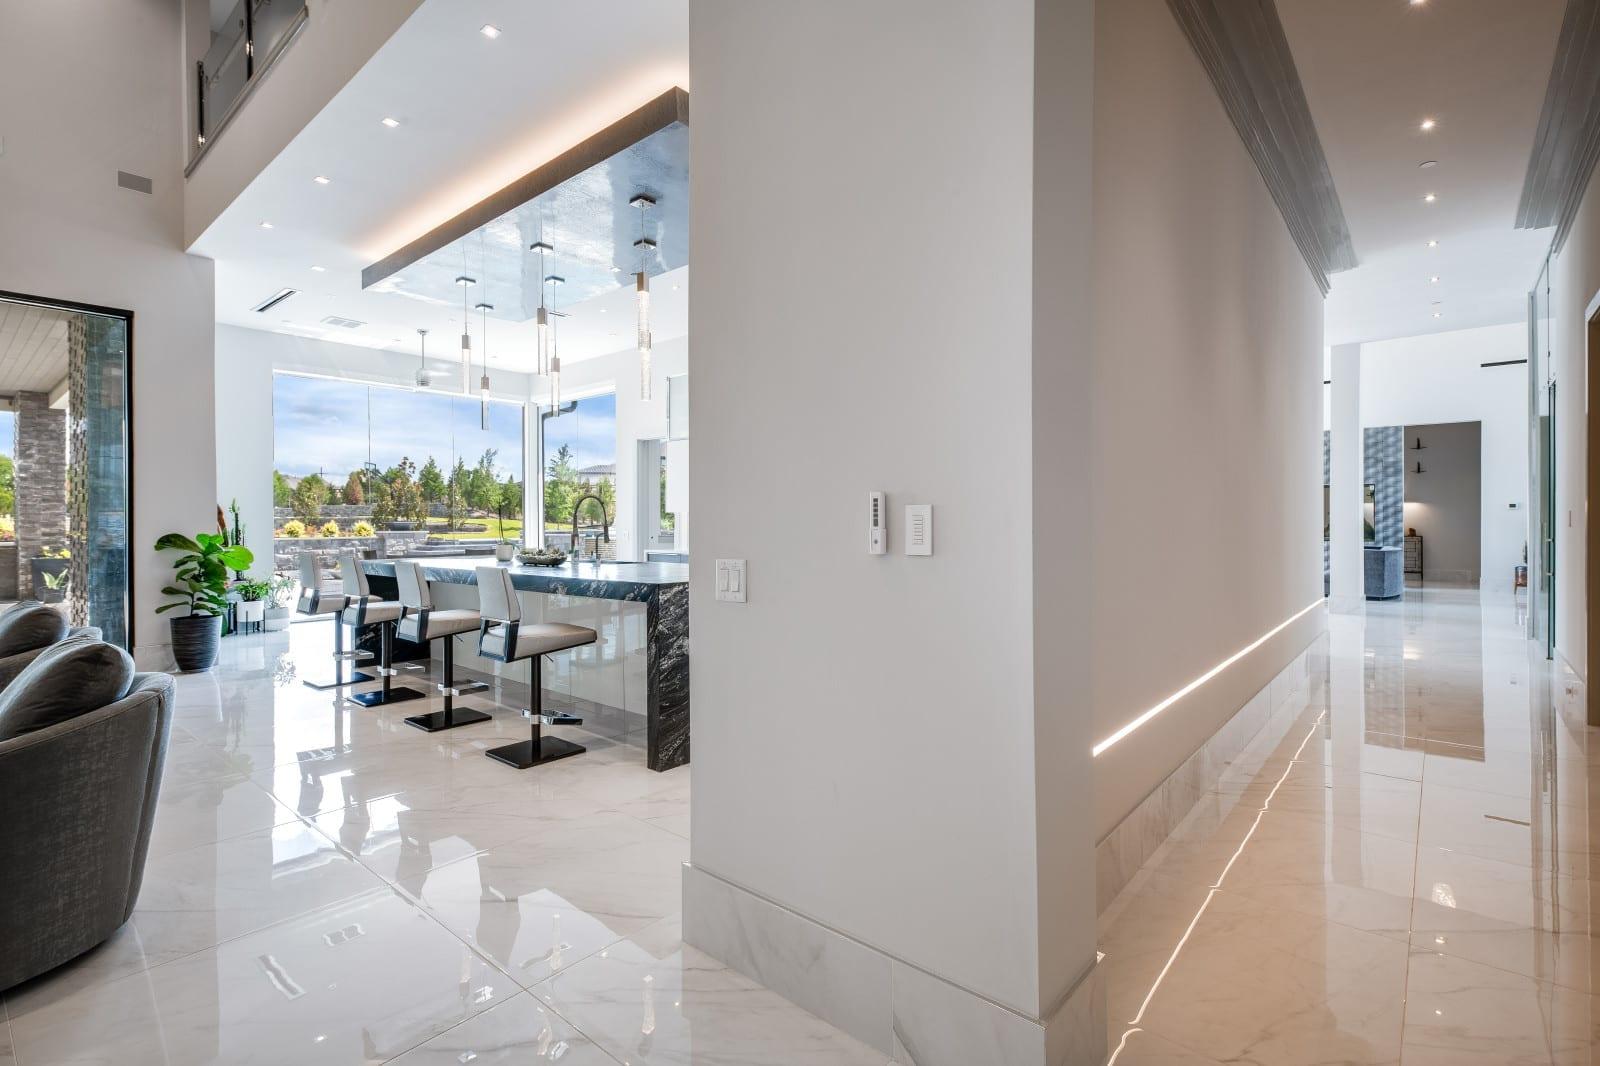 Custom Home Build and Interior Design # 7 - Millennial Design + Build, Custom Home Builders in Dallas Texas, modern style homes, Property Evaluator, Interior Designers, using BIM Technology and Home 3D Model.